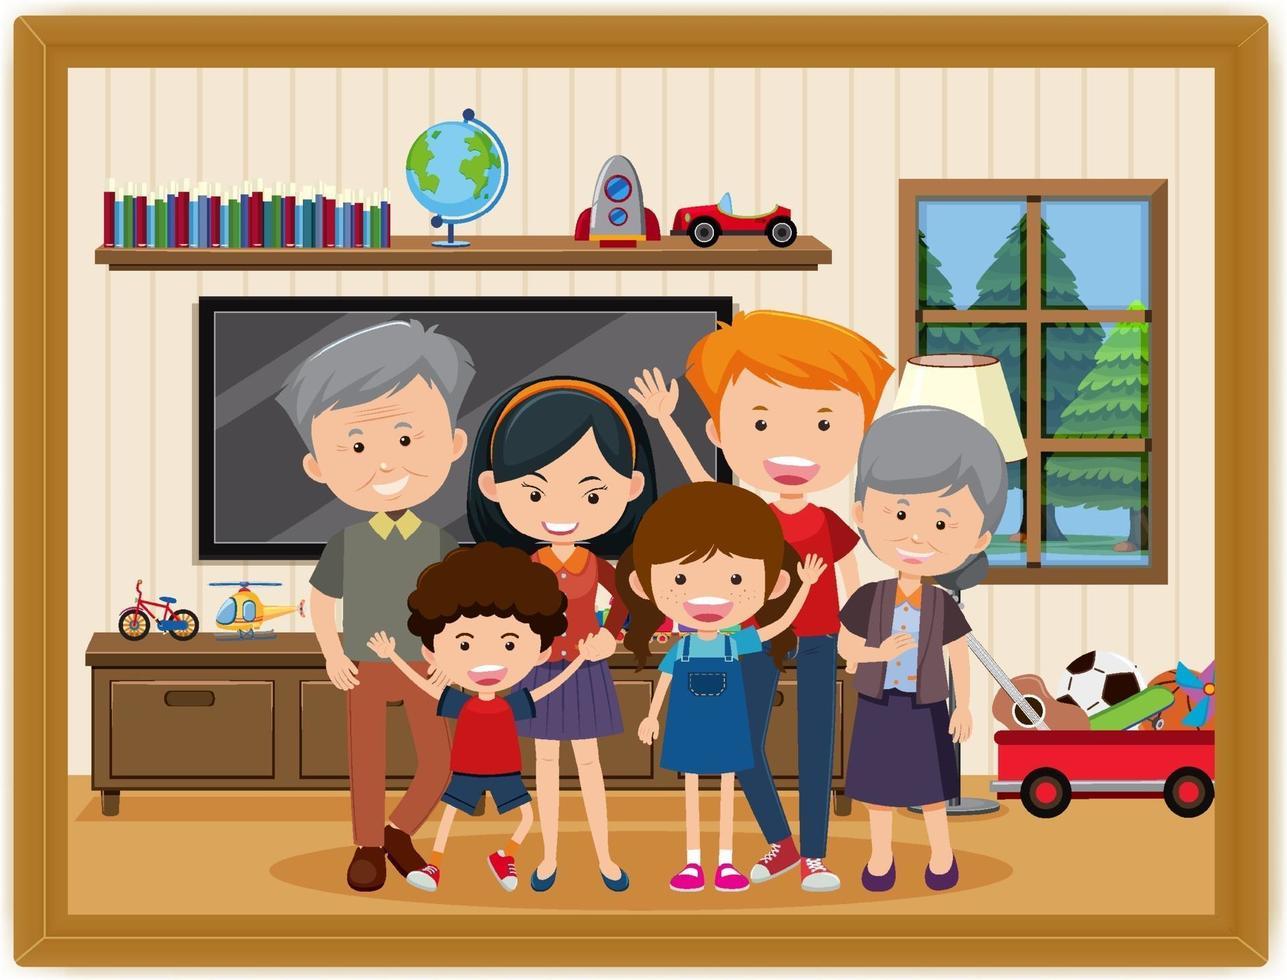 Happy family in the living room scene photo in a frame vector